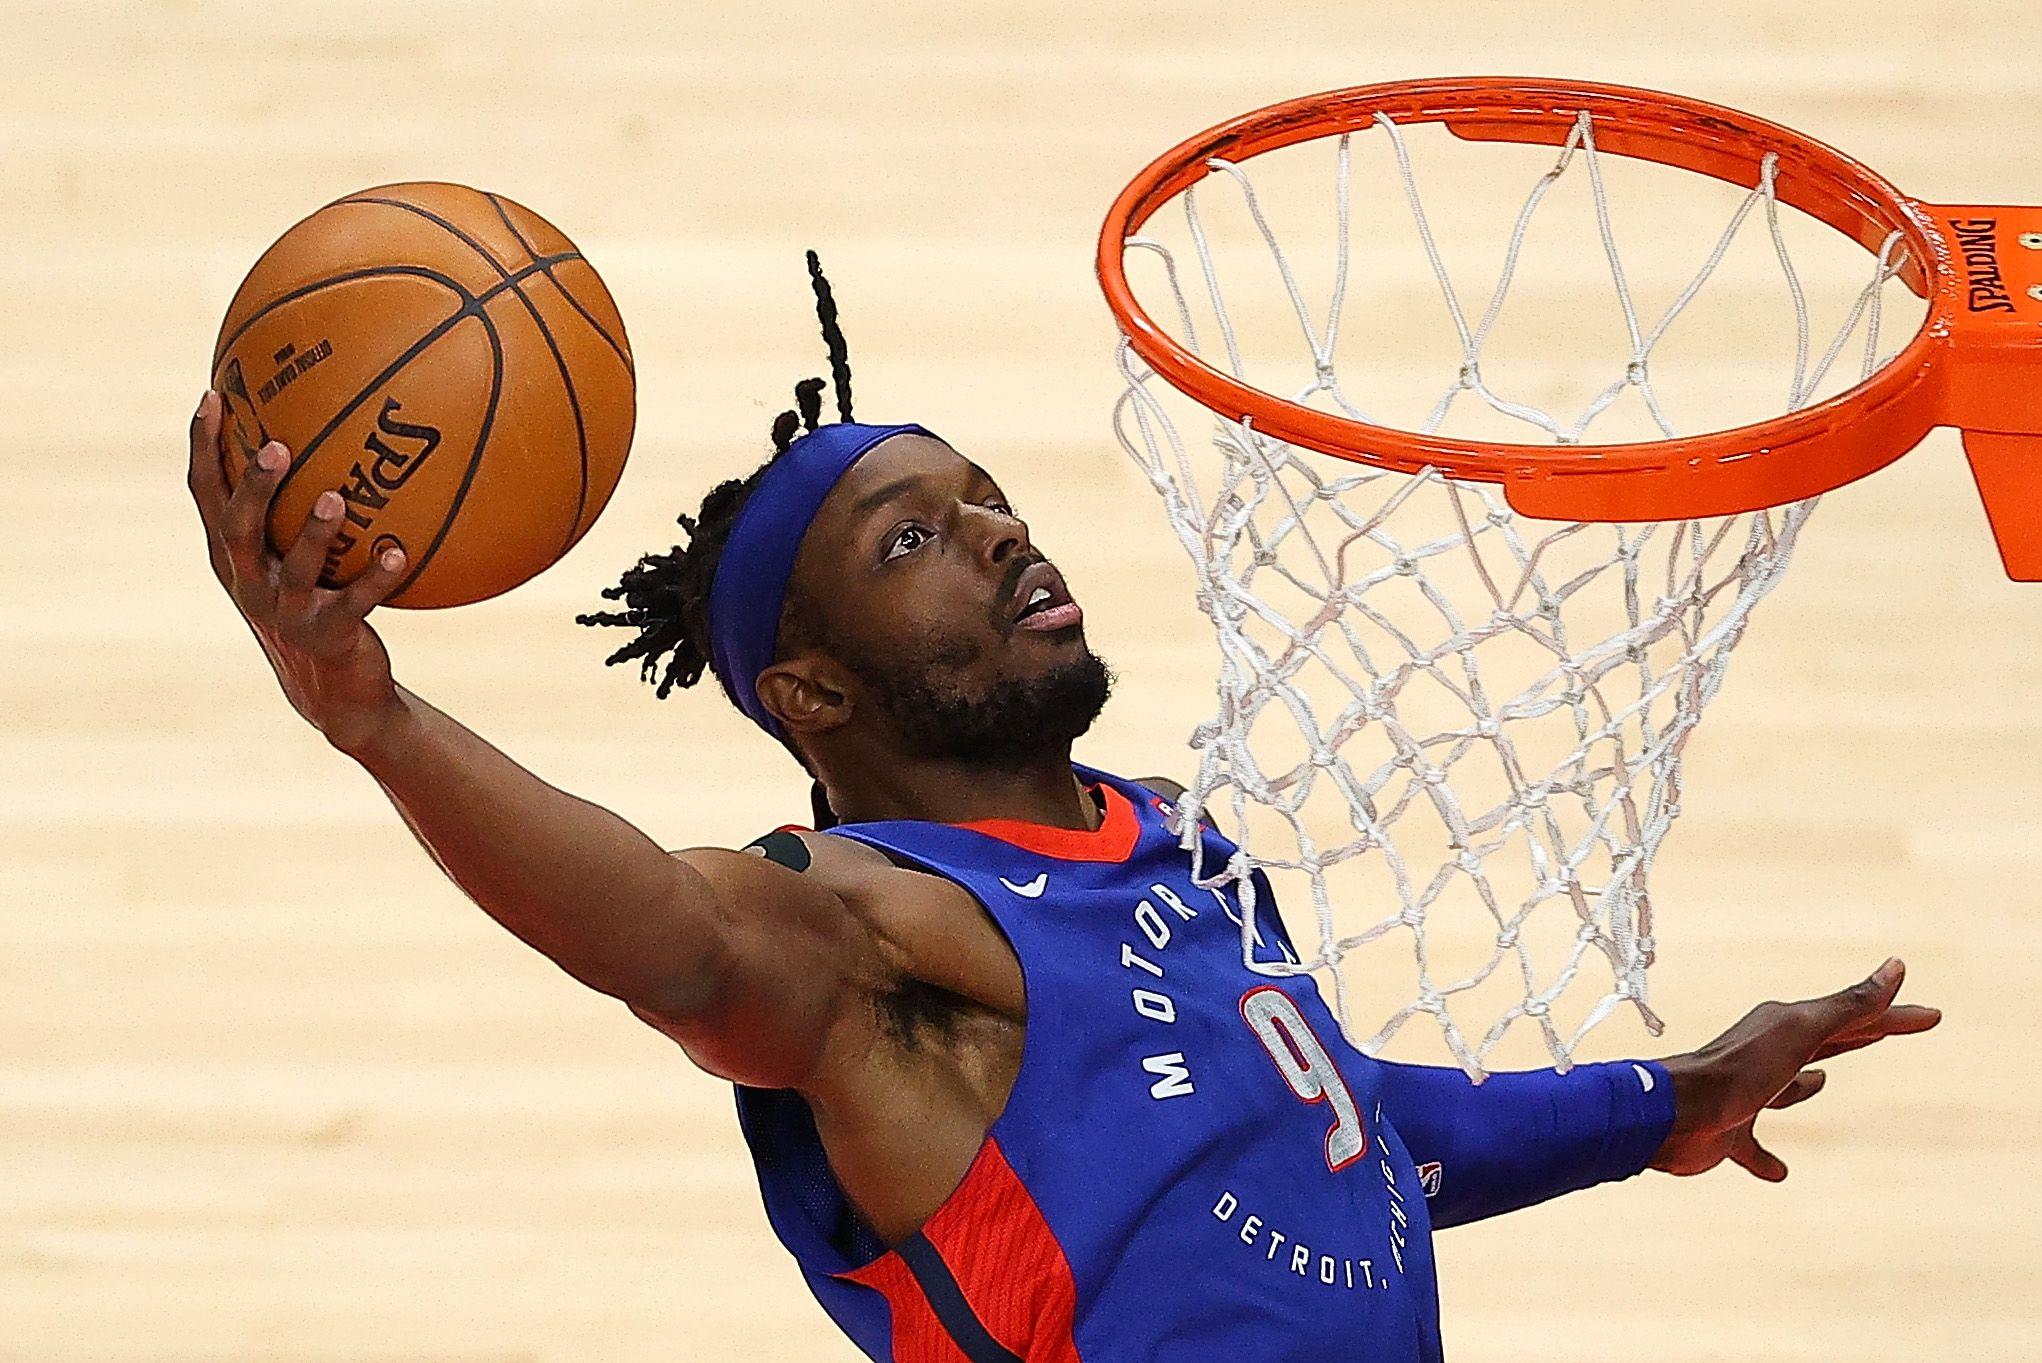 Jerami Grant dunks the ball